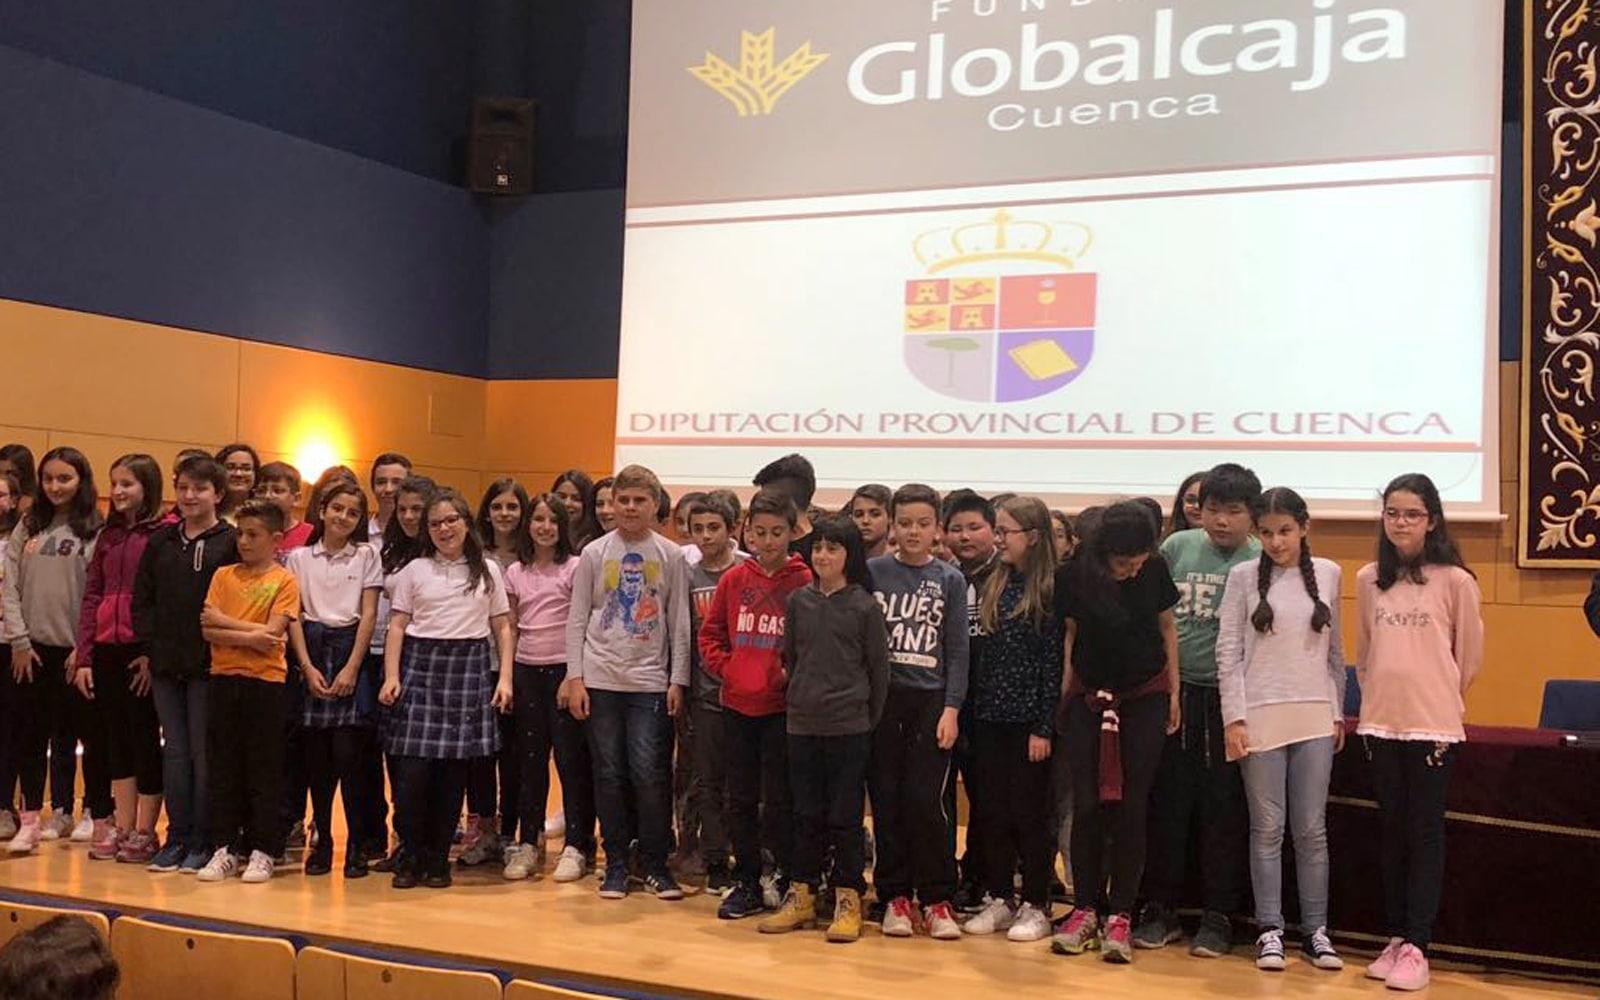 https://blog.globalcaja.es/wp-content/uploads/2018/05/IMG-20180426-WA0003_W.jpg